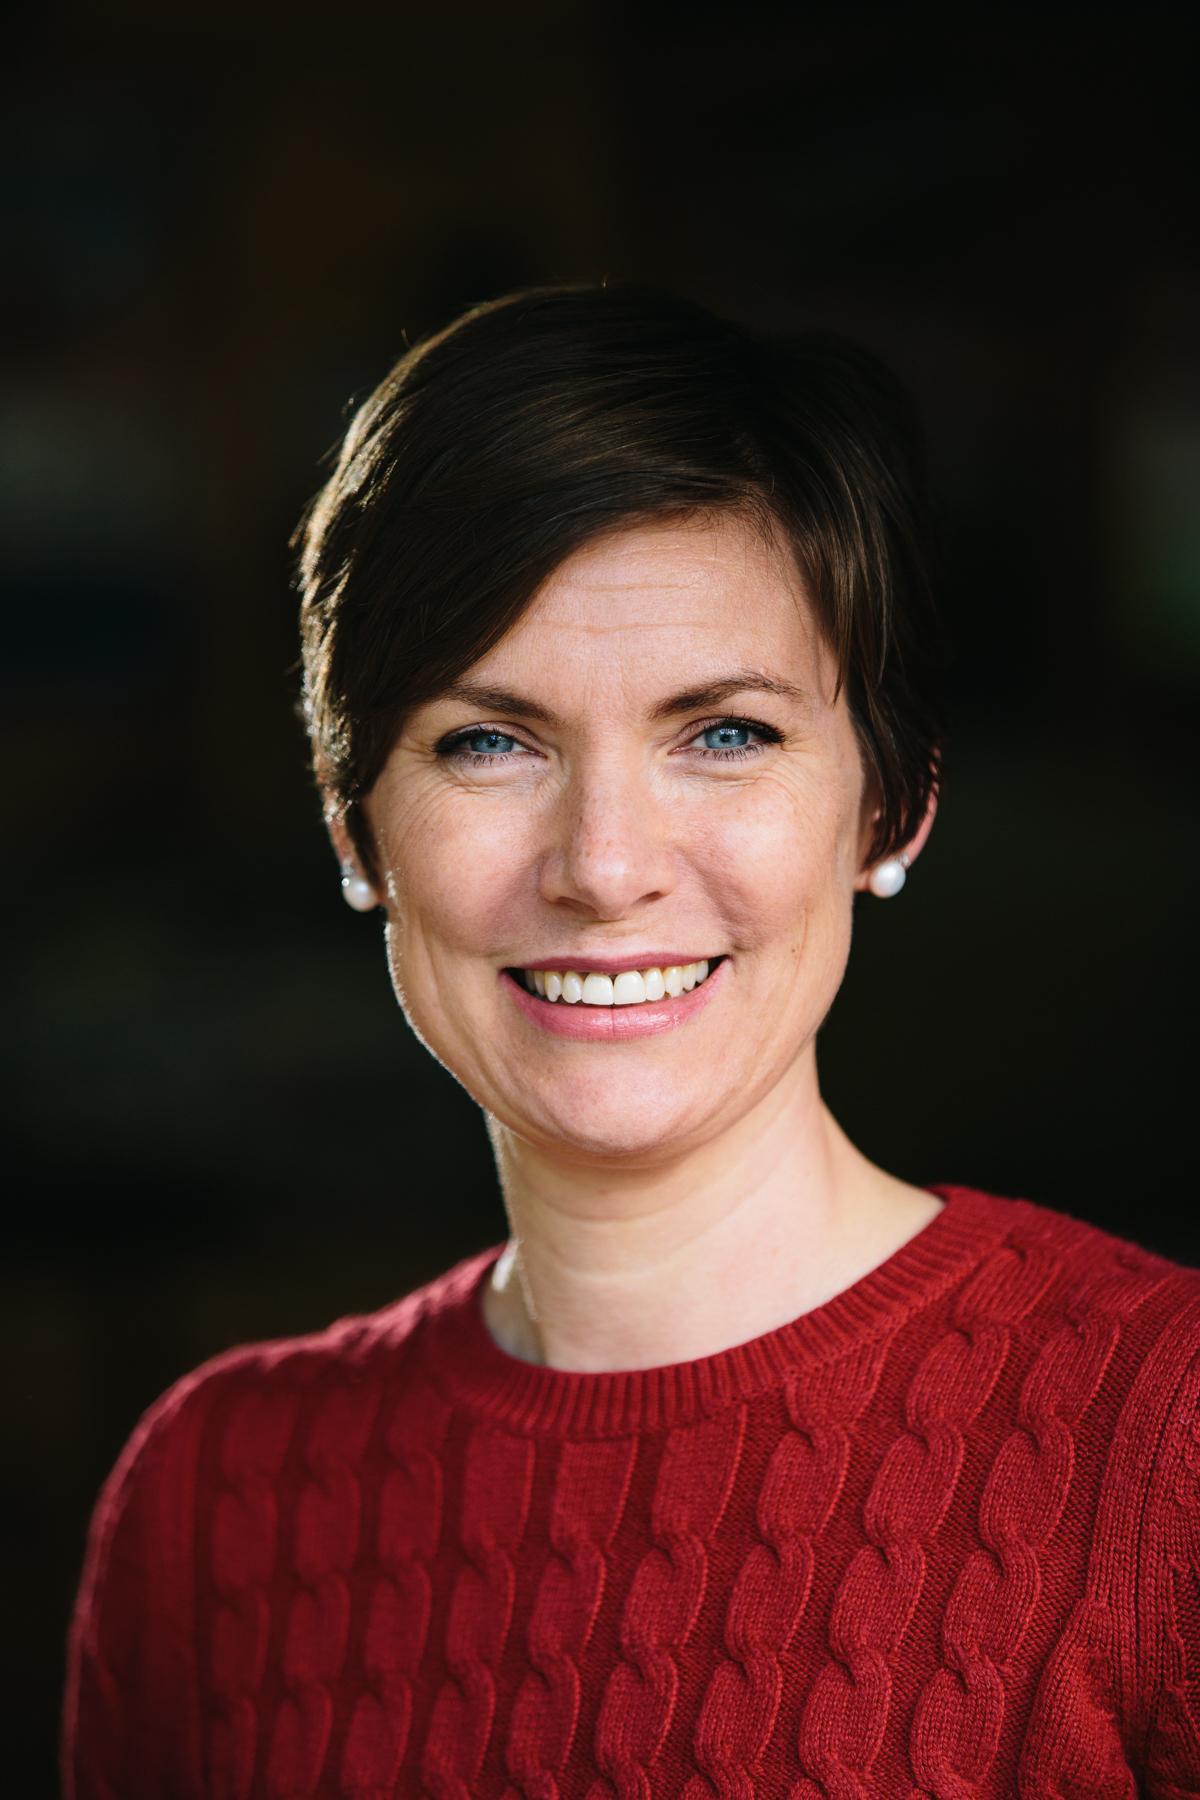 Ivy Spohnholz Wikipedia